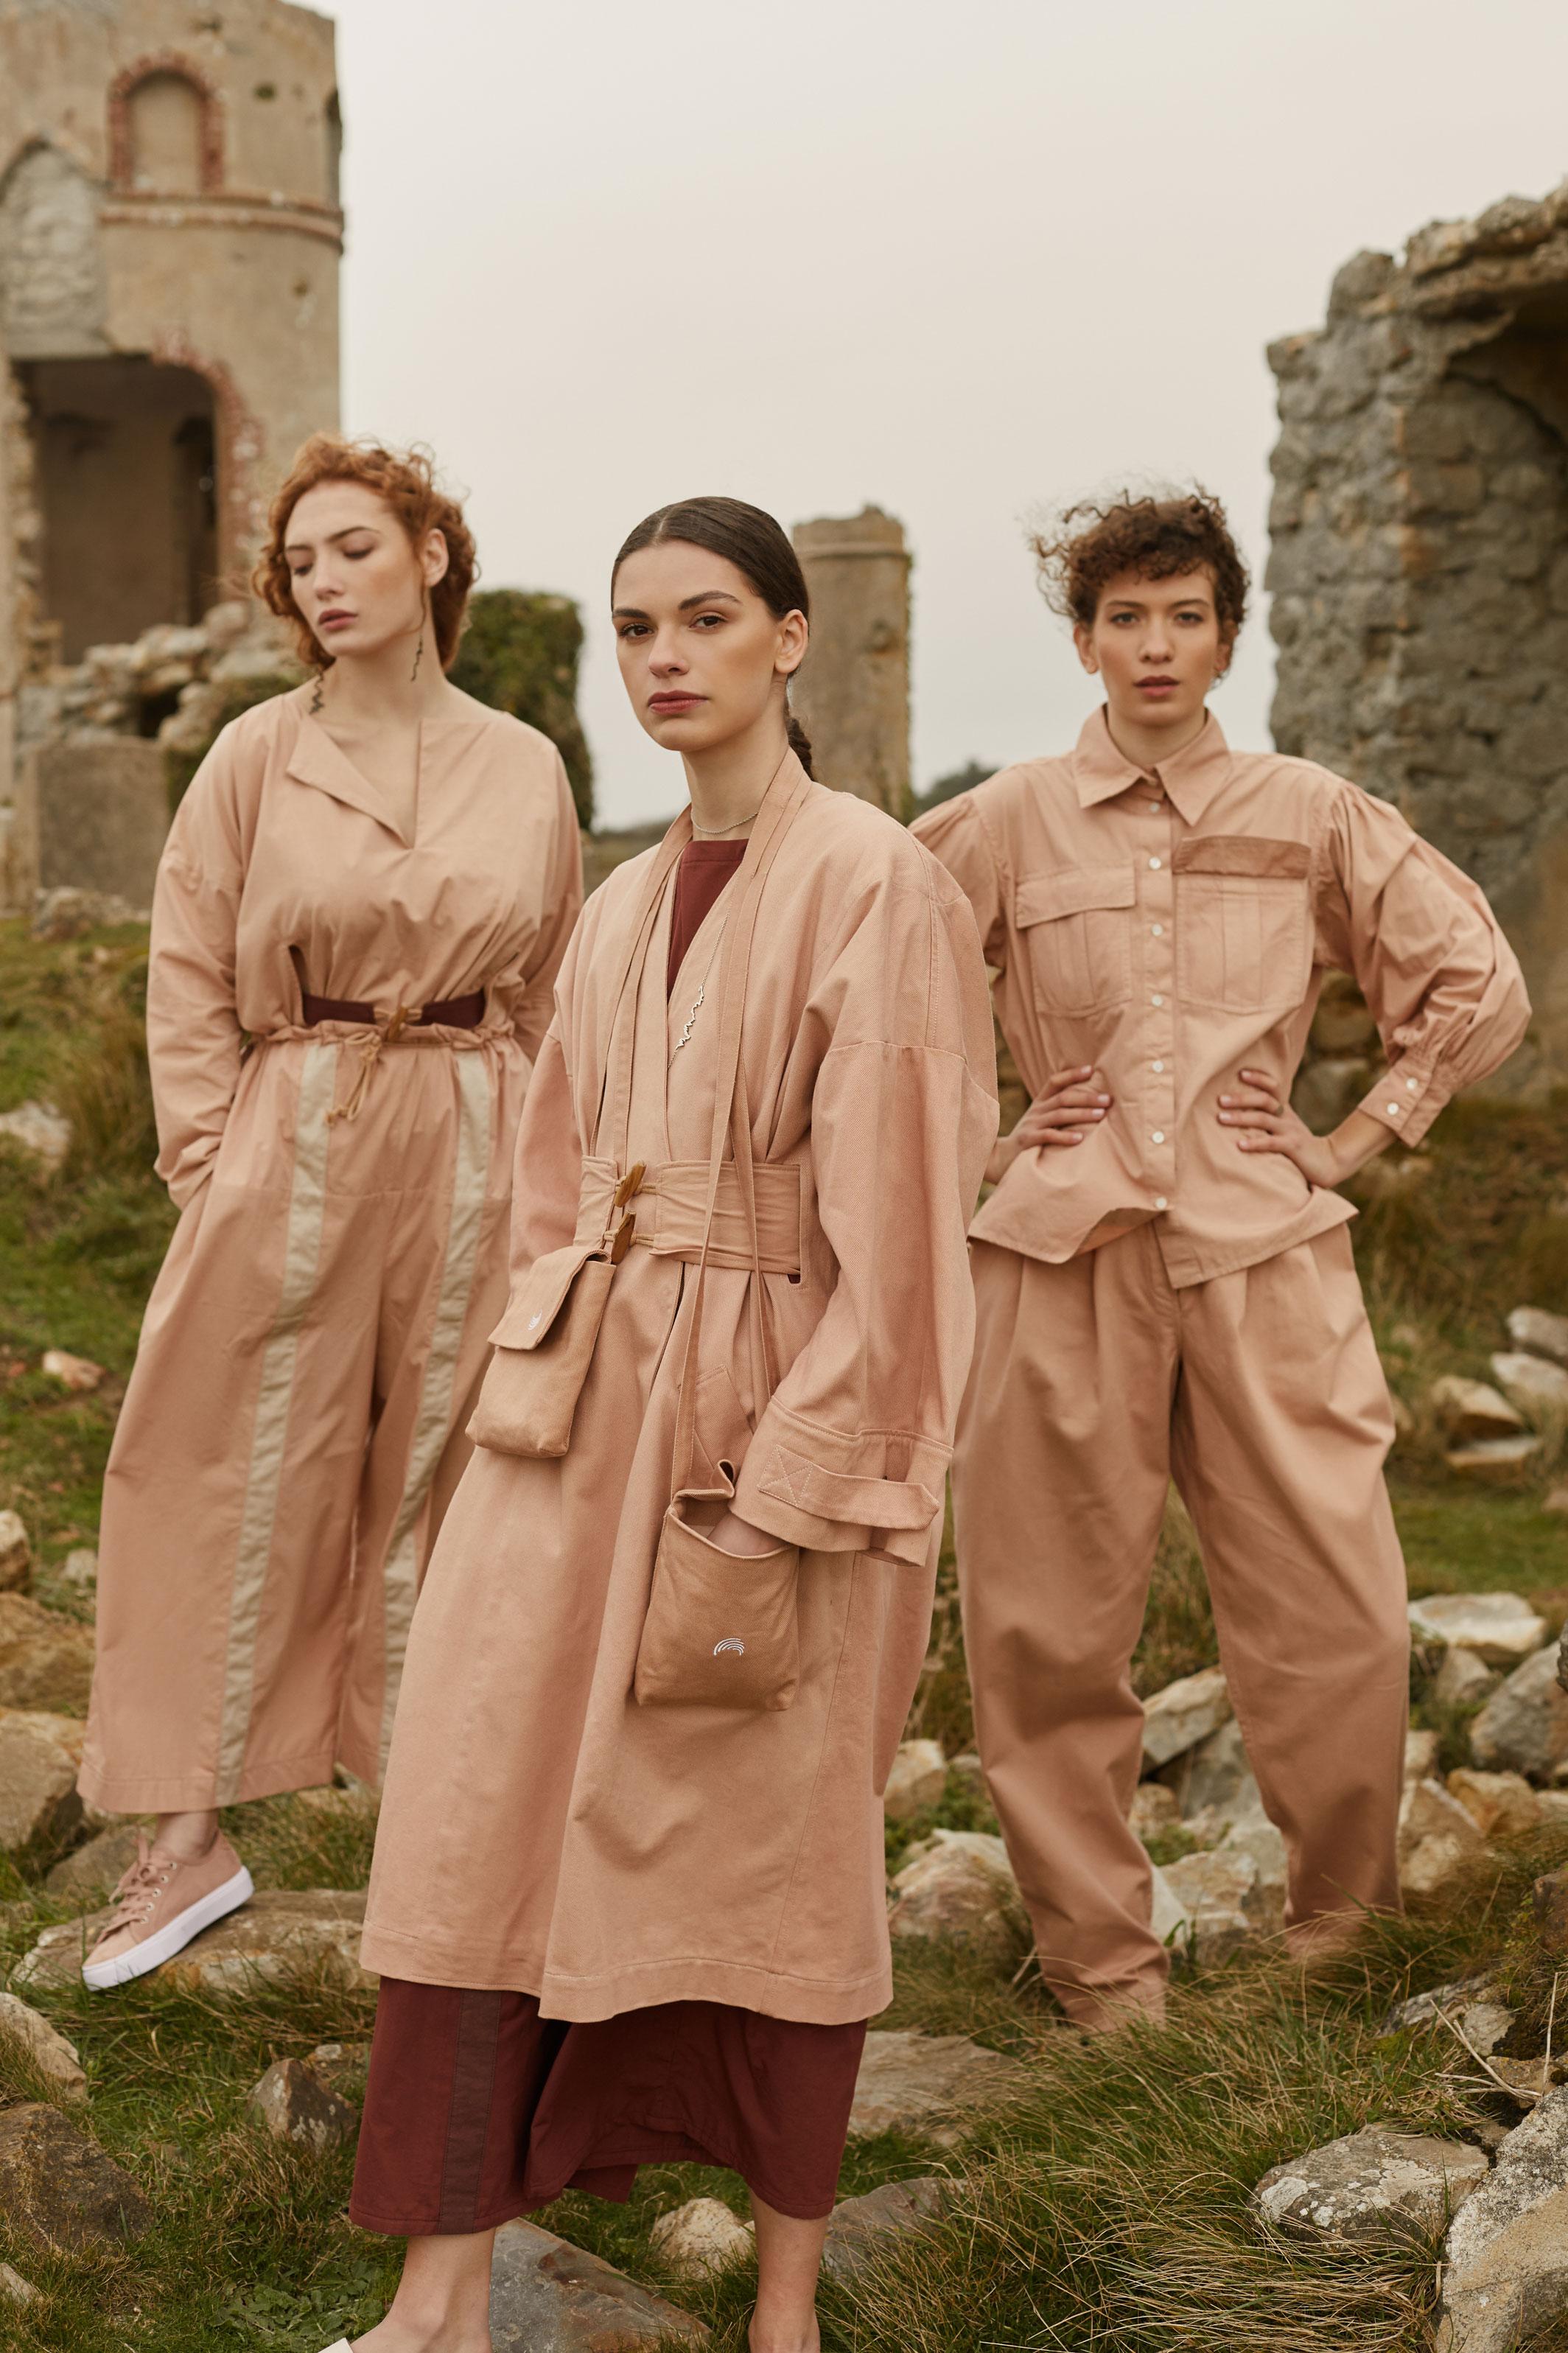 photographe mode pour nolwenn faligot, designer en bretagne